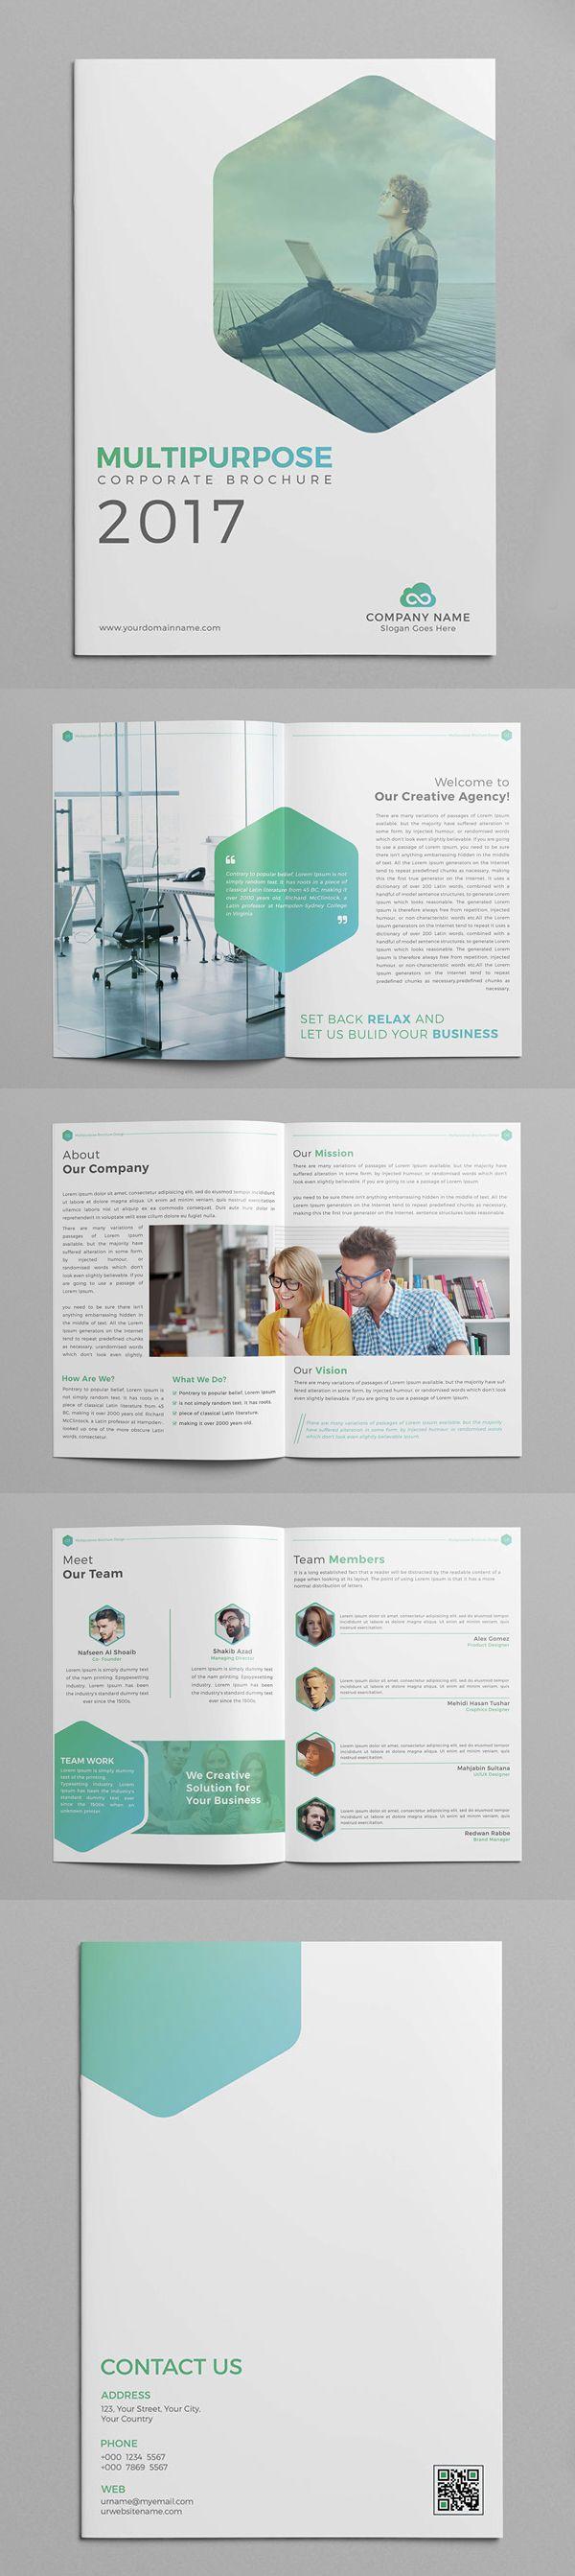 Multipurpose Company Profile Brochure Template